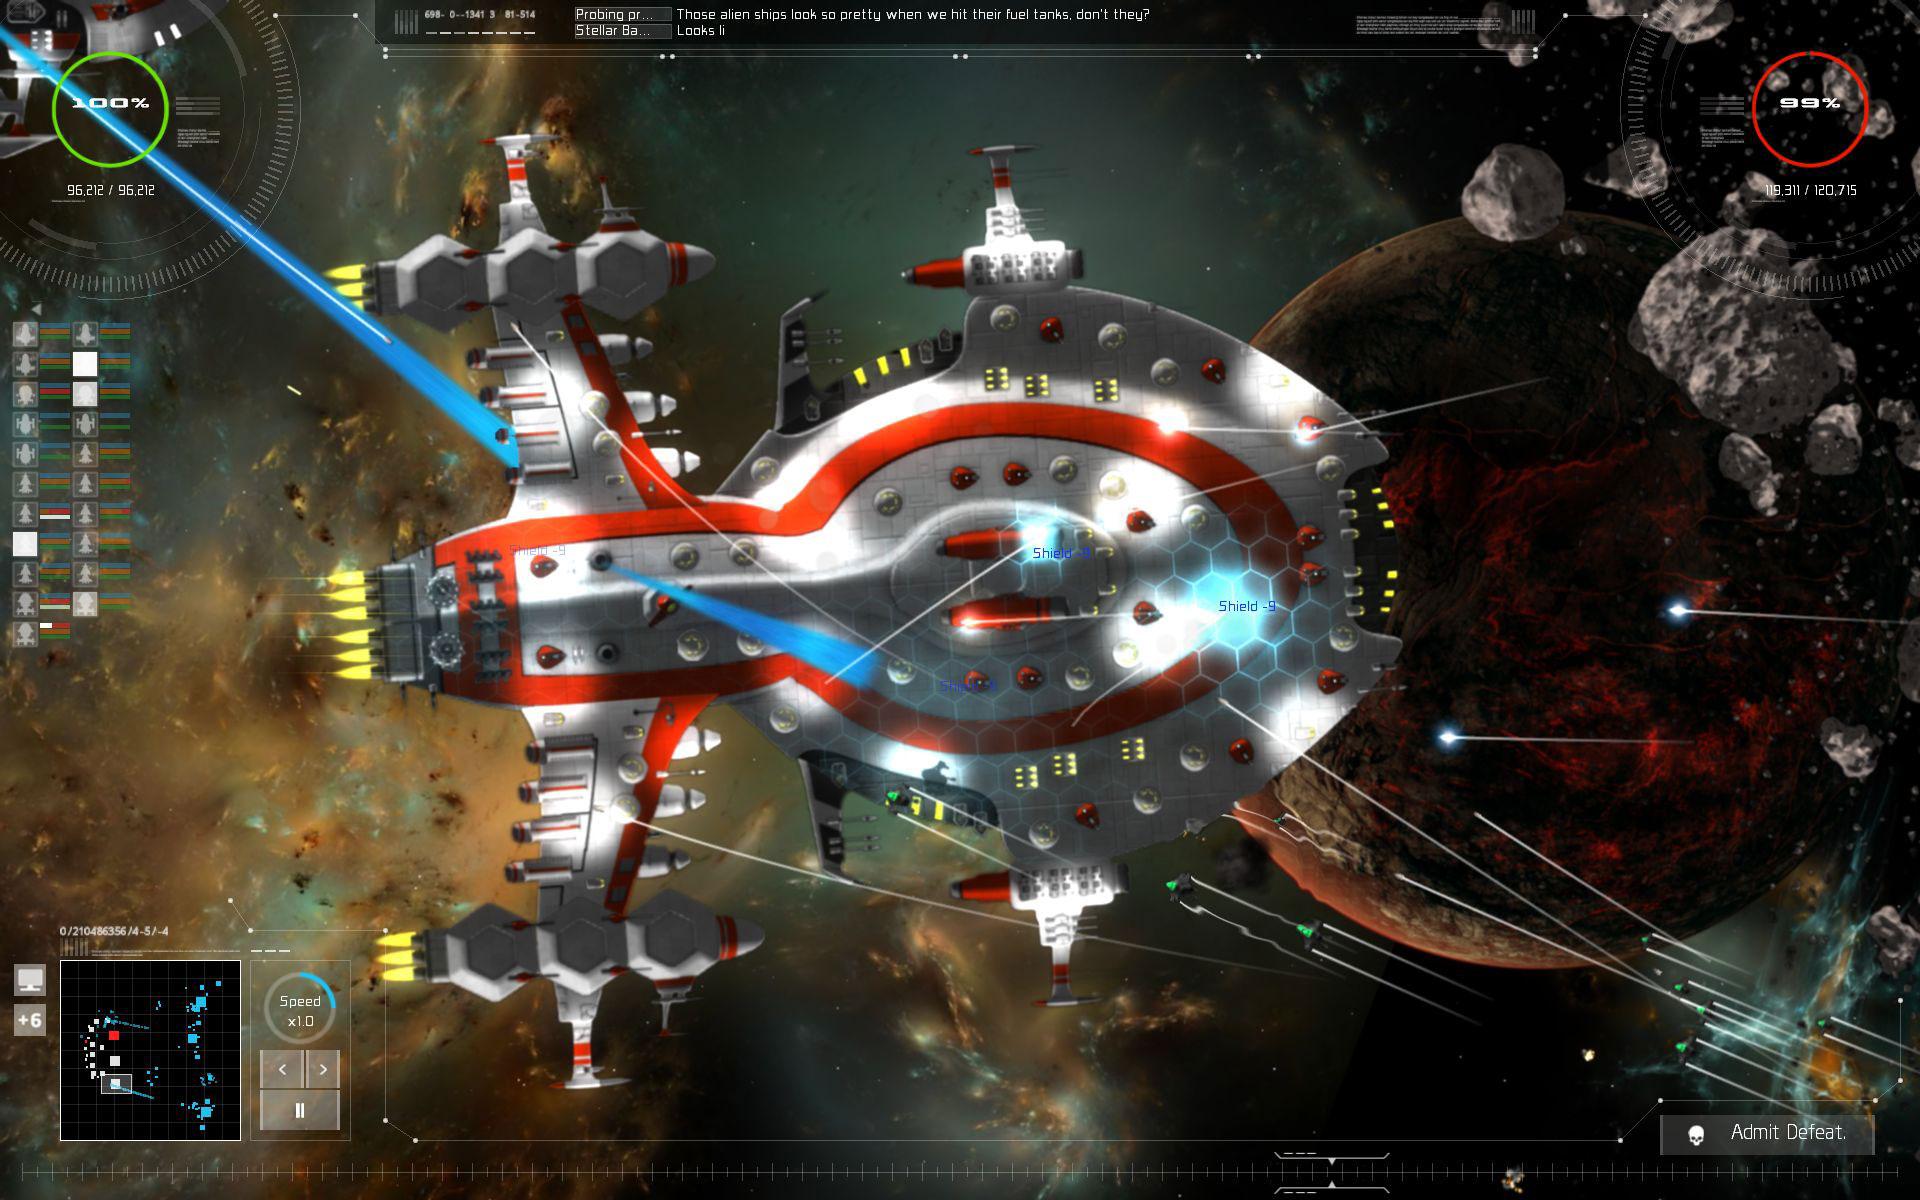 spacecraft computer game - photo #20